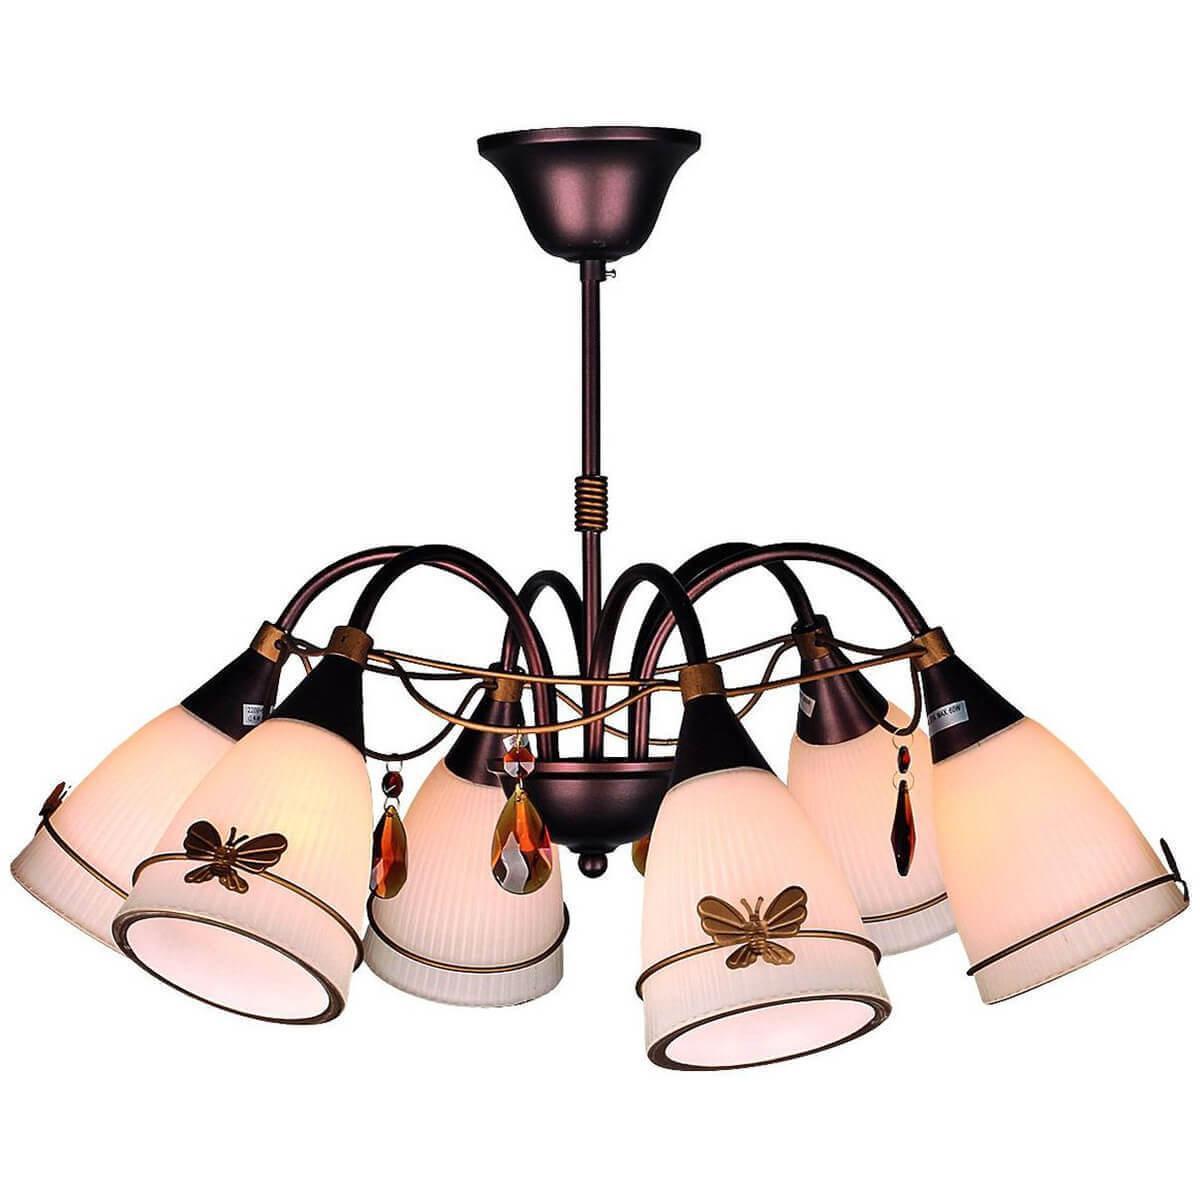 Подвесной светильник Omnilux OML-36307-06, E14, 60 Вт